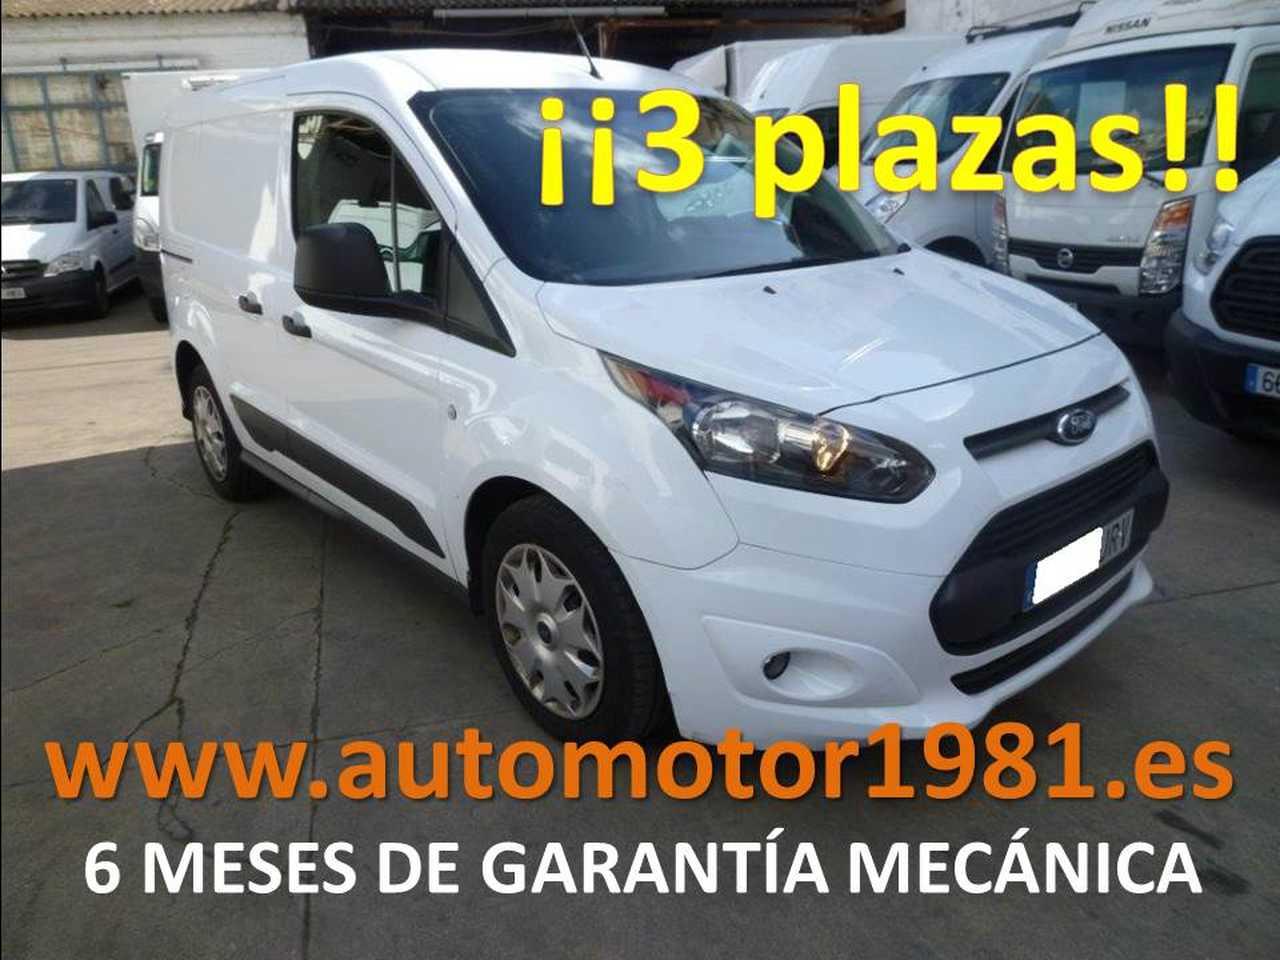 Ford Transit Connect FT 200 Van L1 Ambiente 3 PLAZAS - 6 MESES GARANTIA MECANICA  - Foto 1